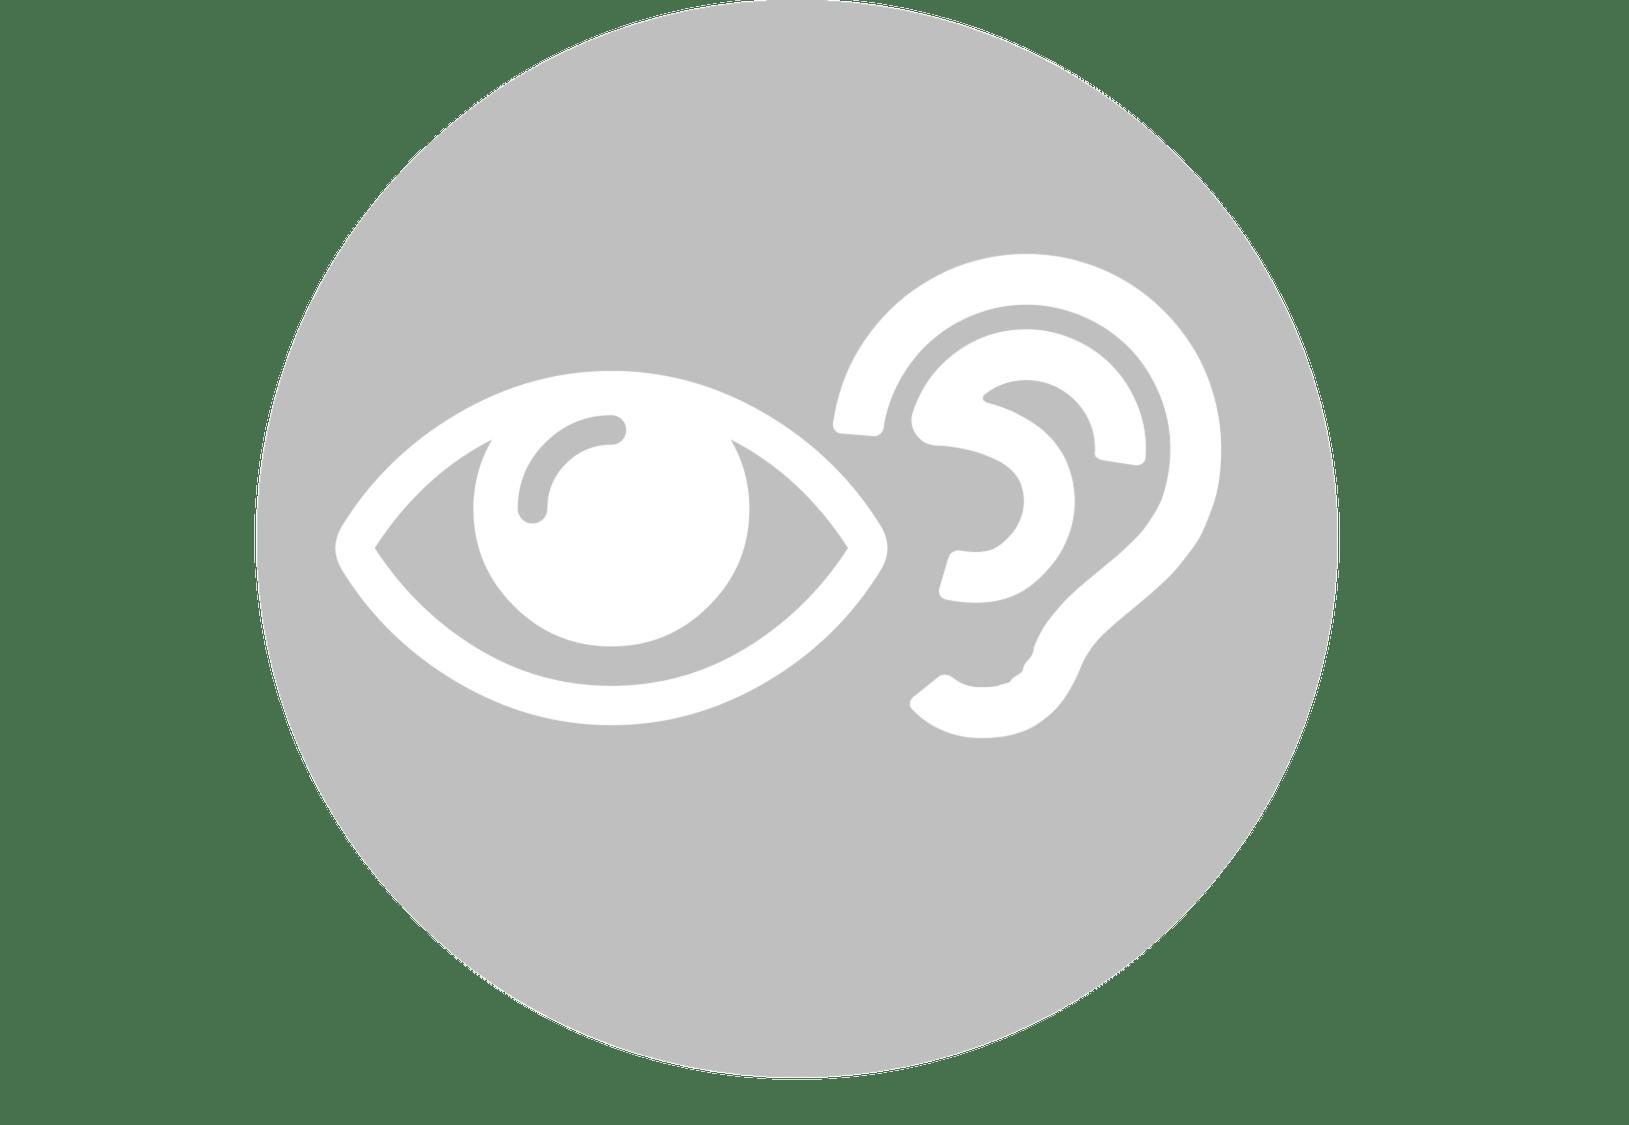 Vision and Hearing